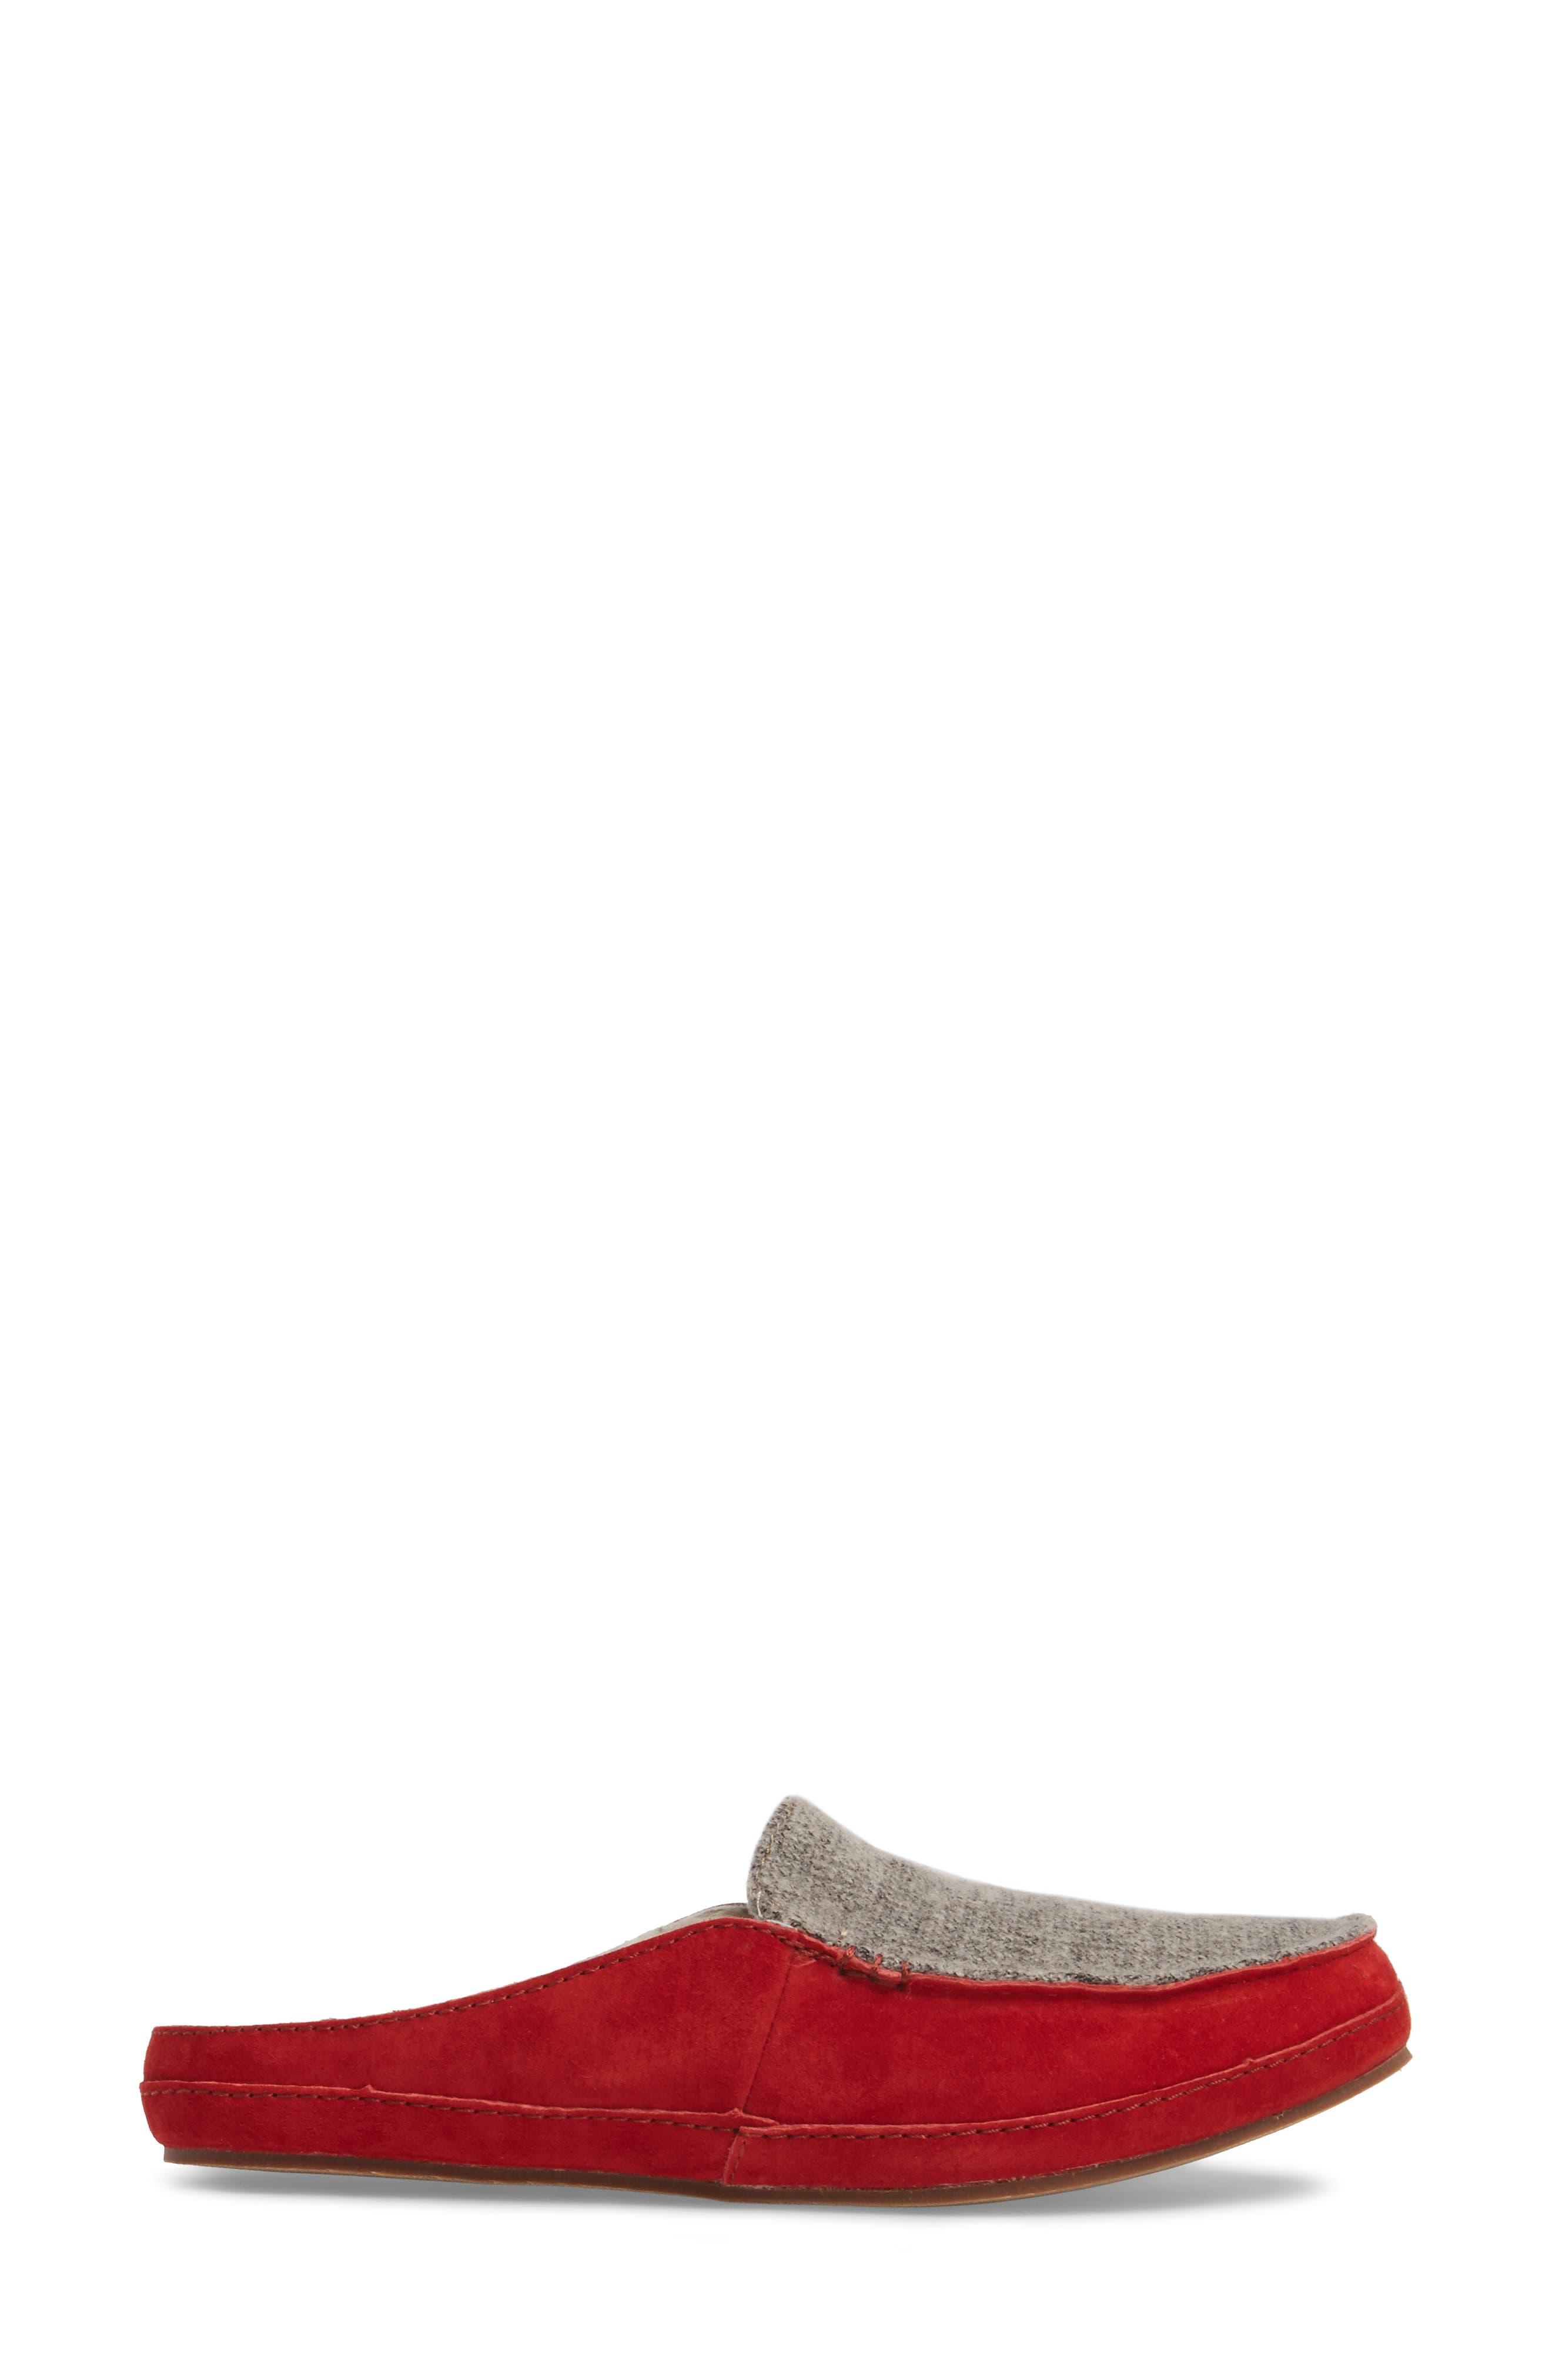 Alternate Image 3  - OluKai Alaula Genuine Shearling Lined Slipper (Women)